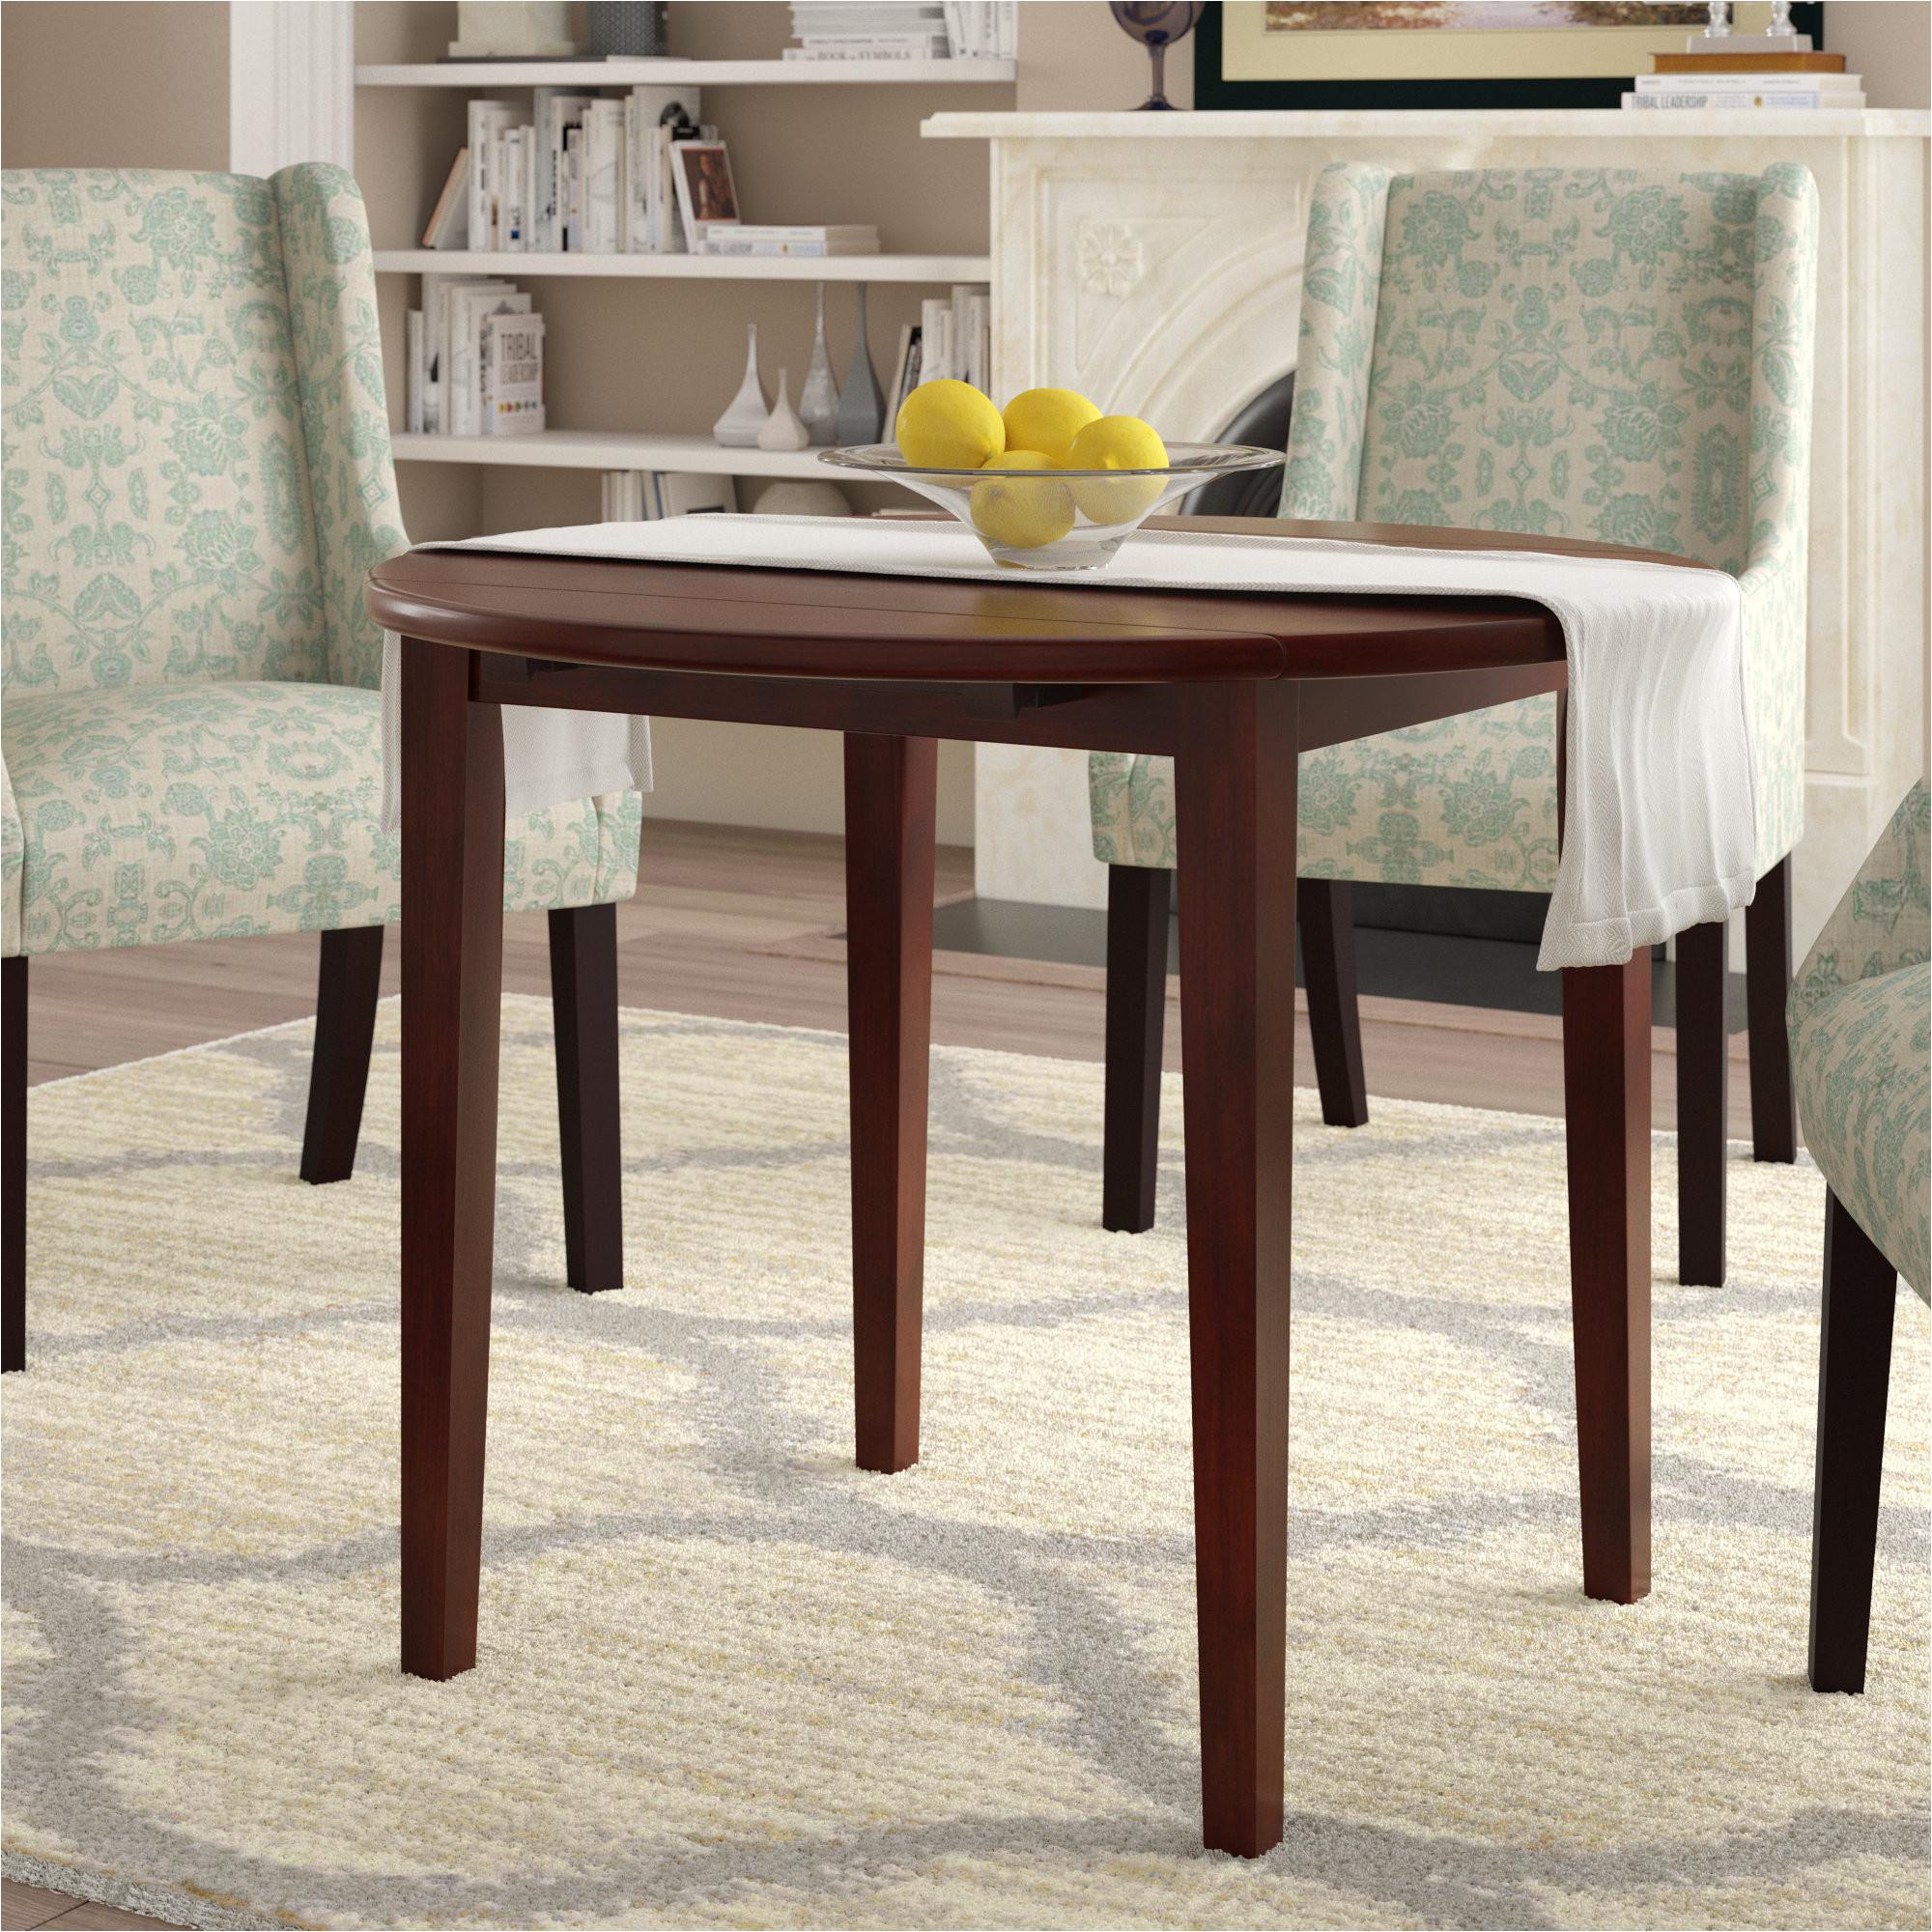 Wood Double Pedestal Table Base Kits Hidden Leaf Dining Table